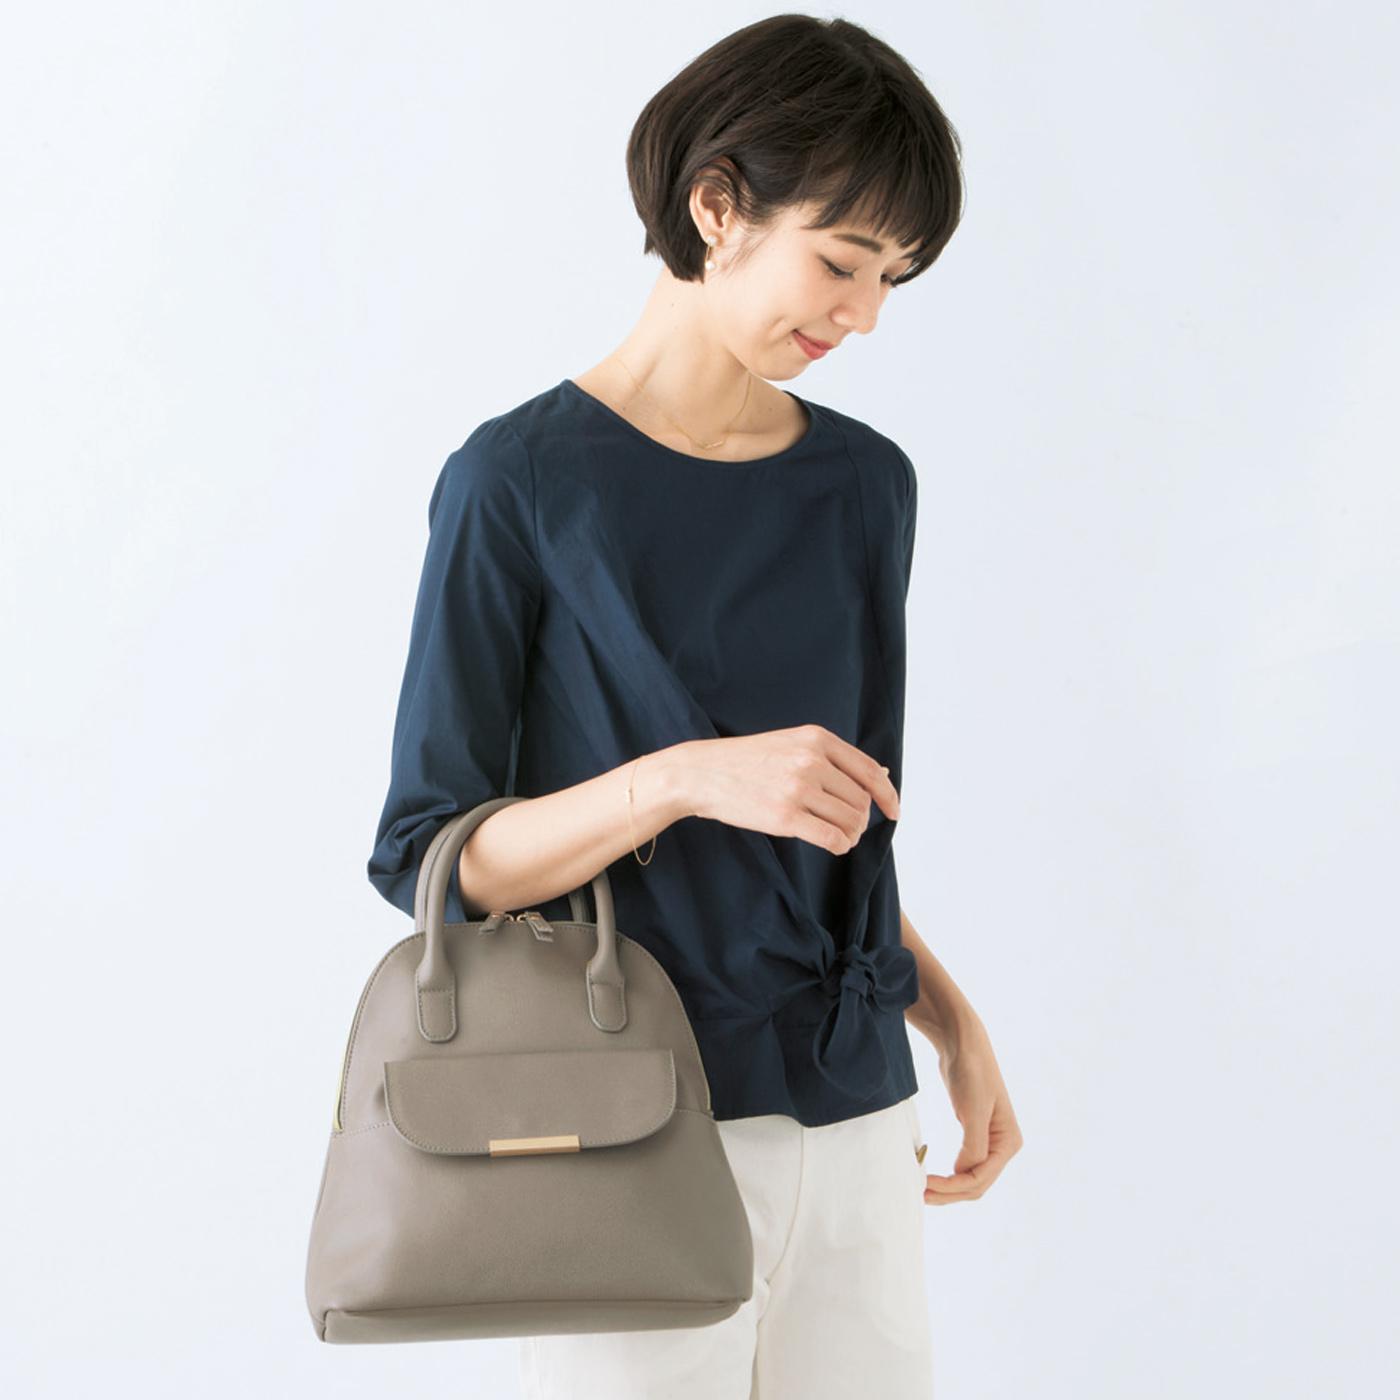 【3-WAY】 ストラップを外してハンドバッグに。